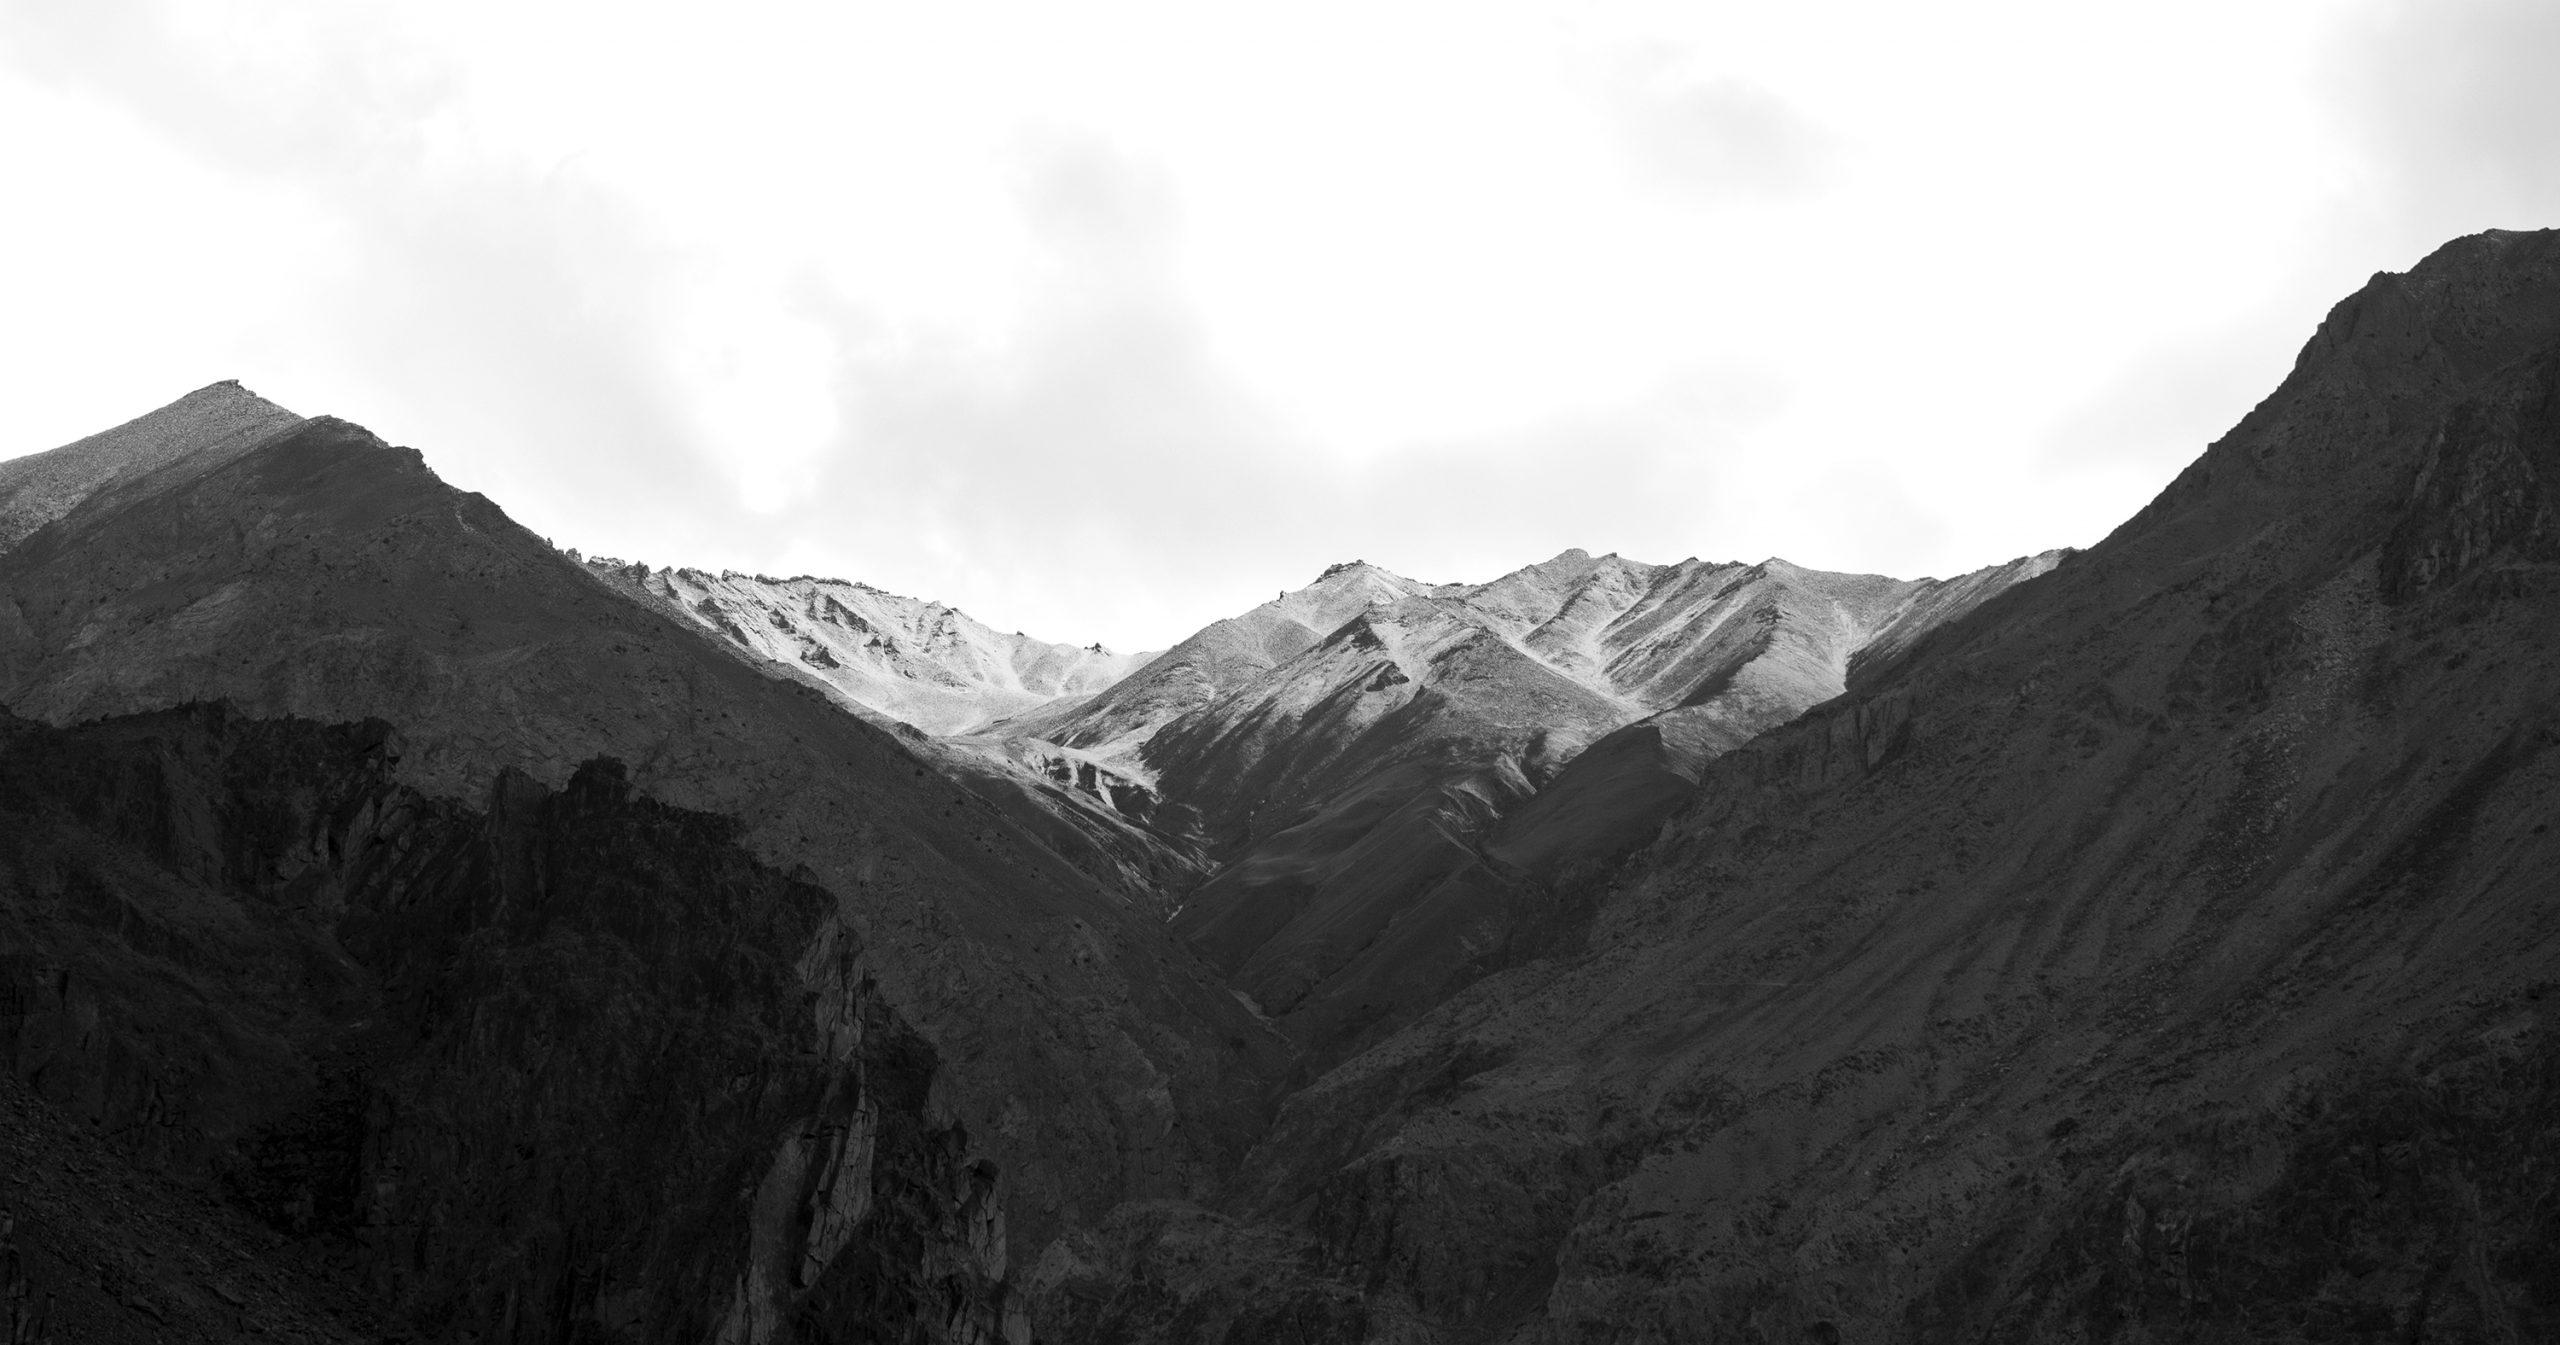 Dry mountains of Leh Ladakh